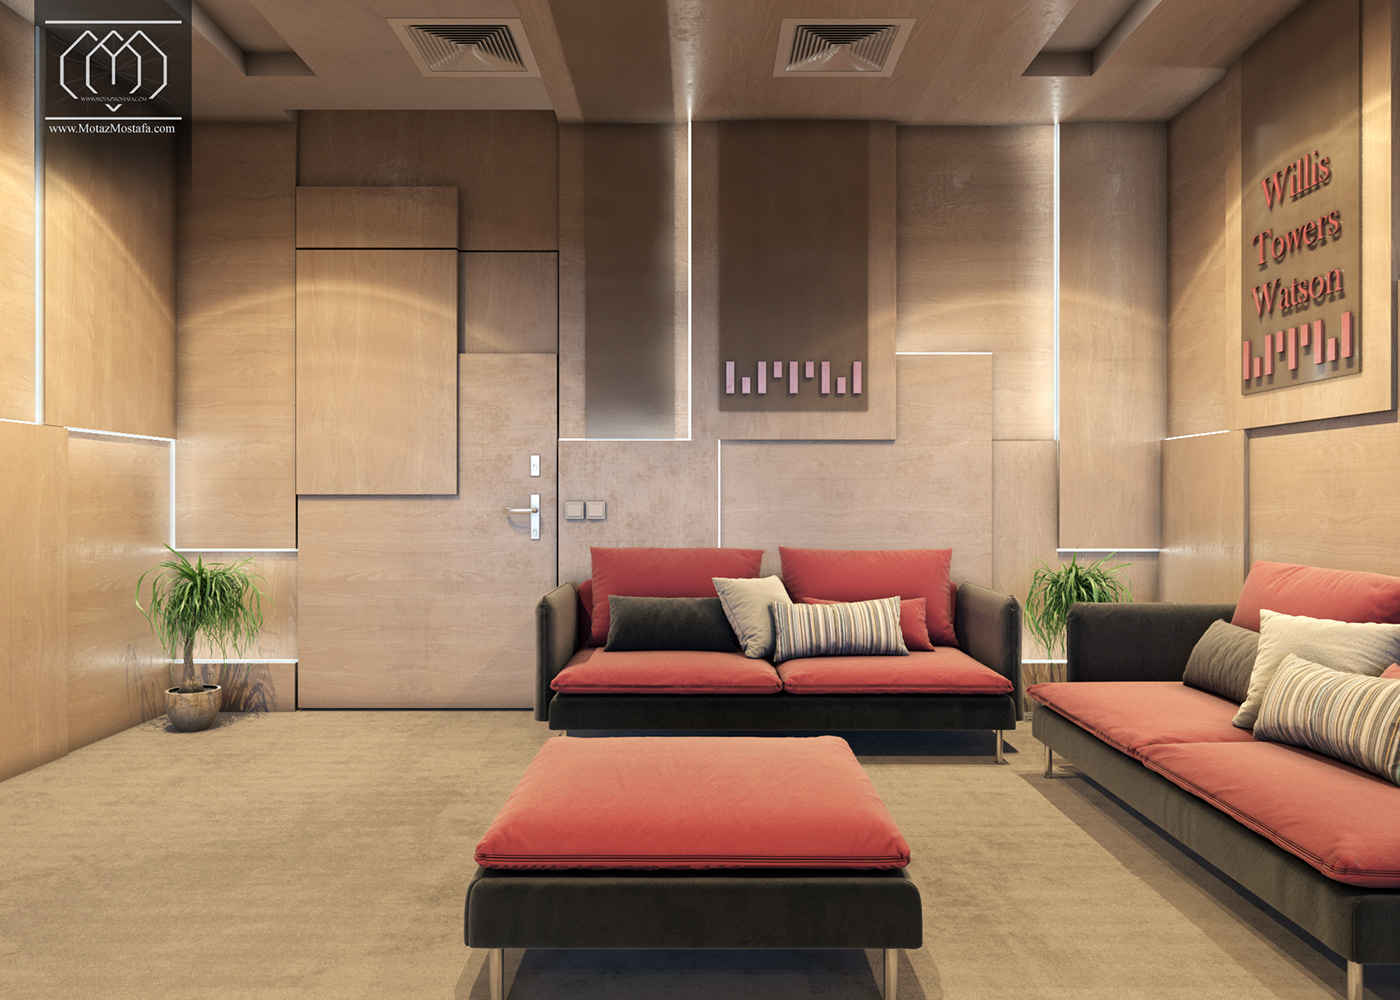 architecture interior design  visualization vray 3dsmax graphics creative design Motaz mostafa Interior